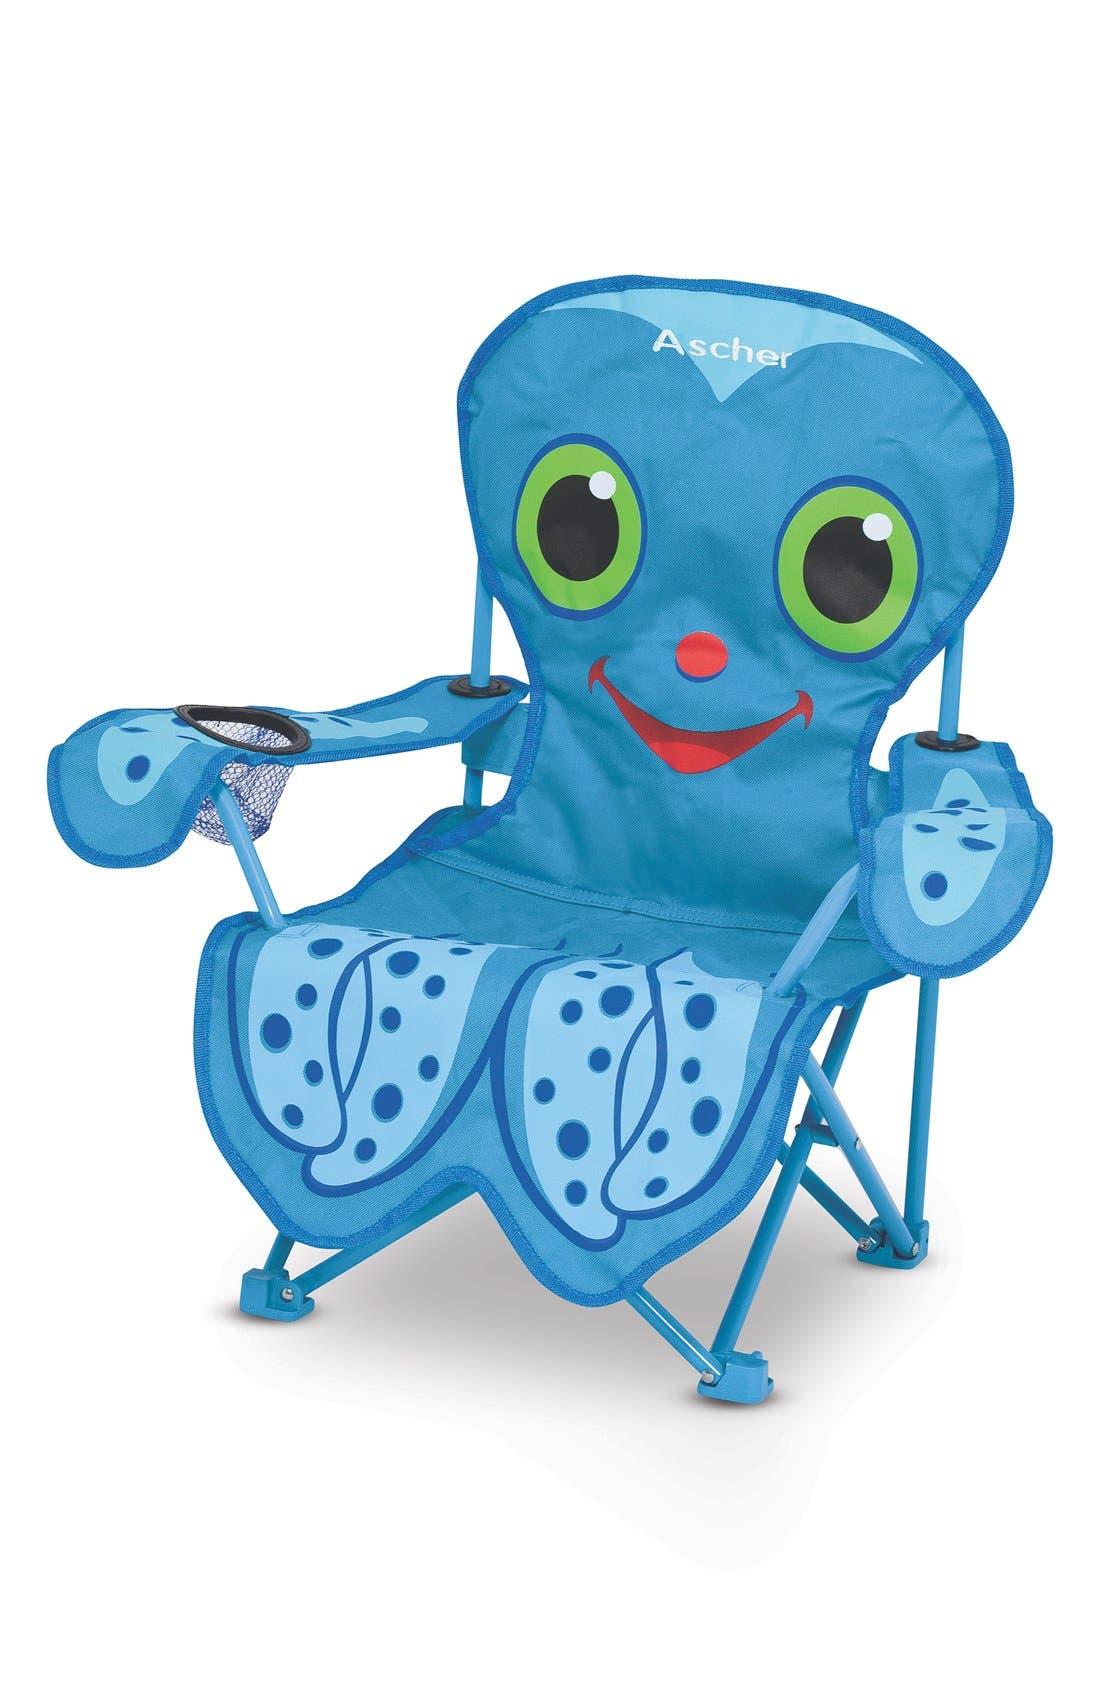 Melissa & Doug 'Flex Octopus' Personalized Folding Chair